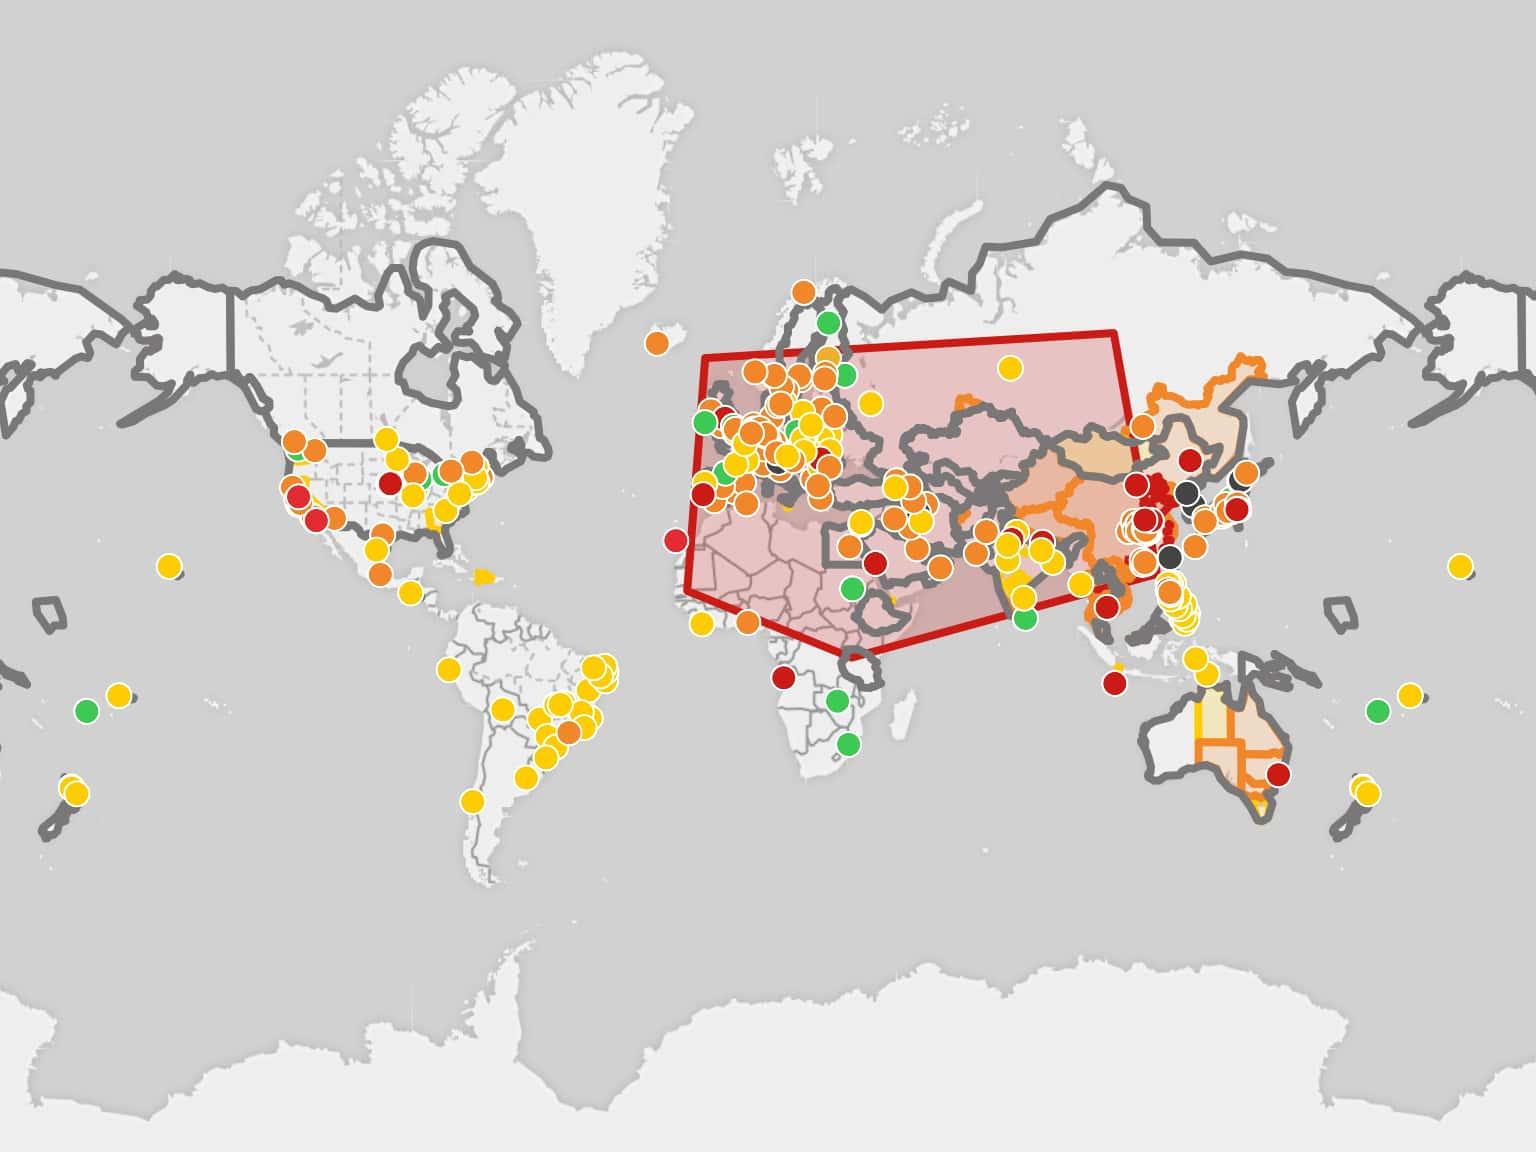 Wuhan Coronavirus Map By Fuuuuuuu Maphub